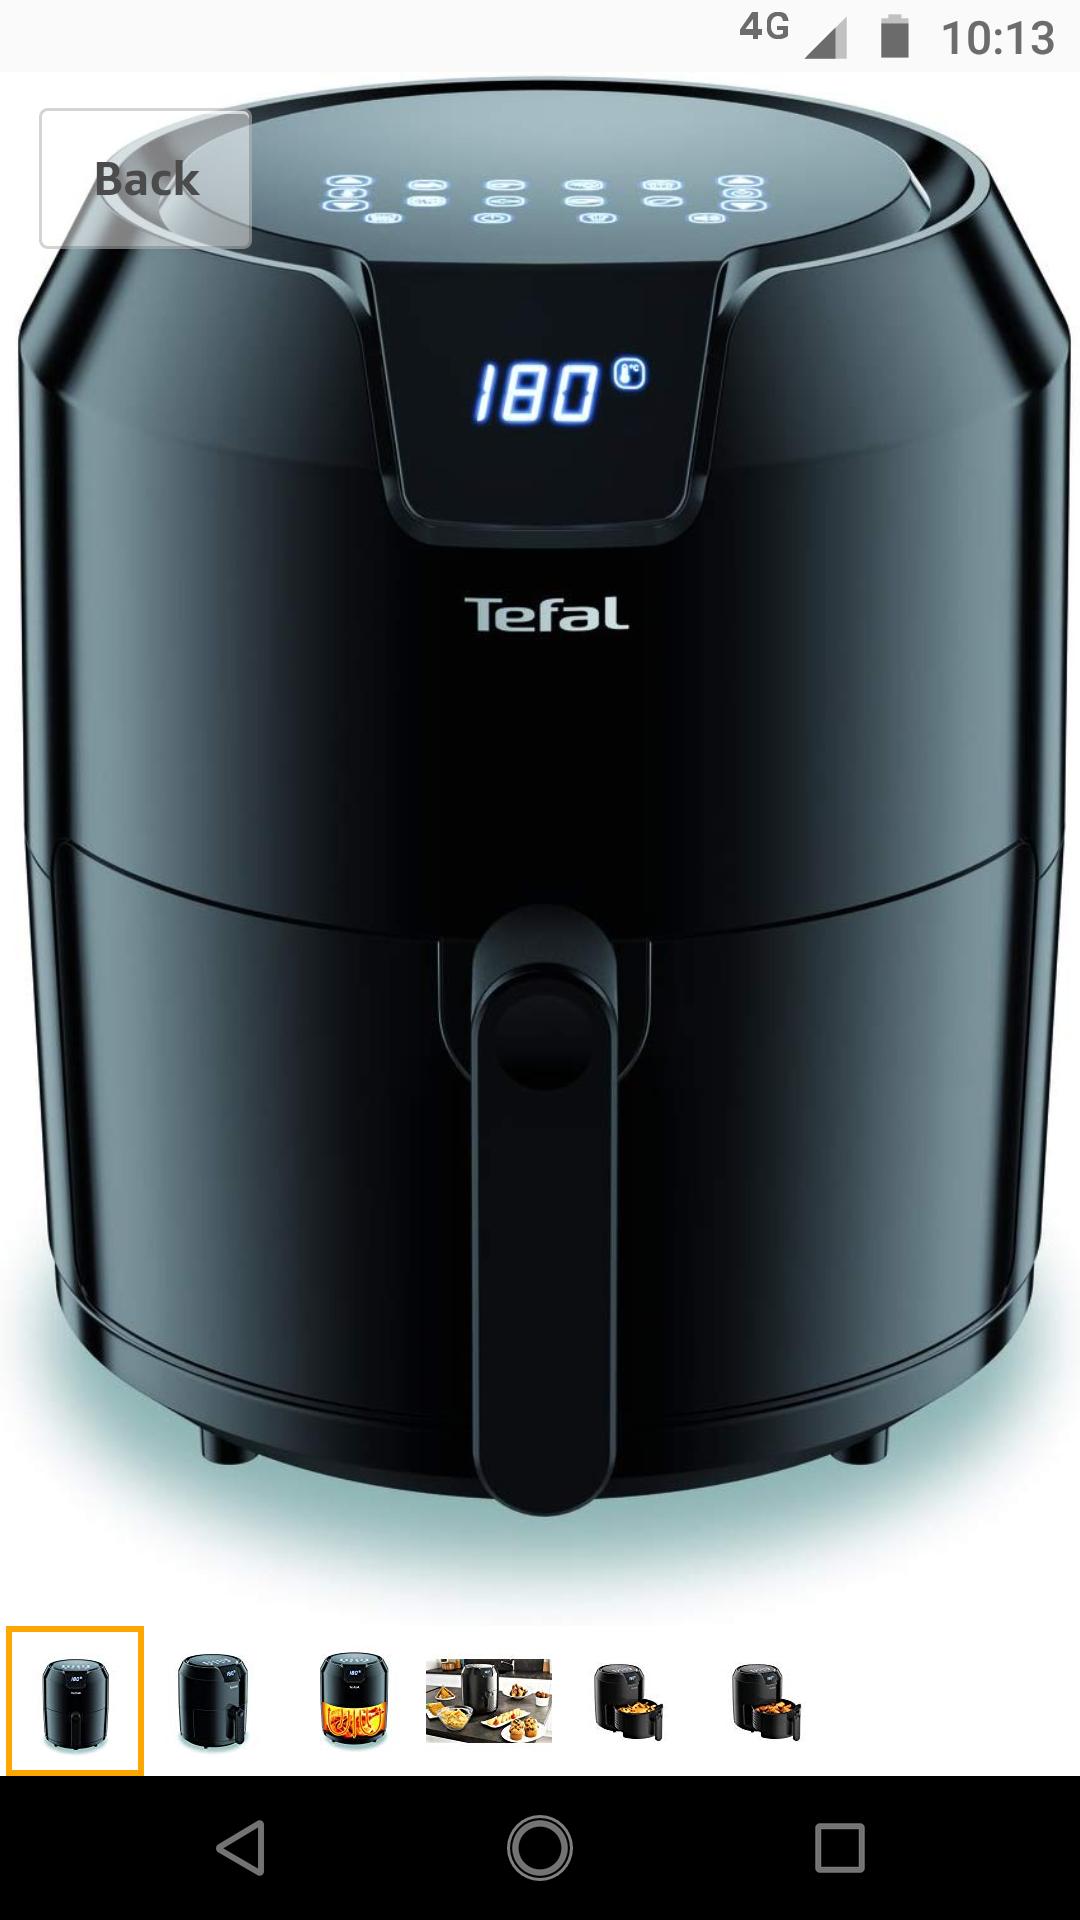 Tefal Easy Fry Precision EY401840 Low Fat/Health Fryer, Air Fryer, 4.2L at Amazon £59